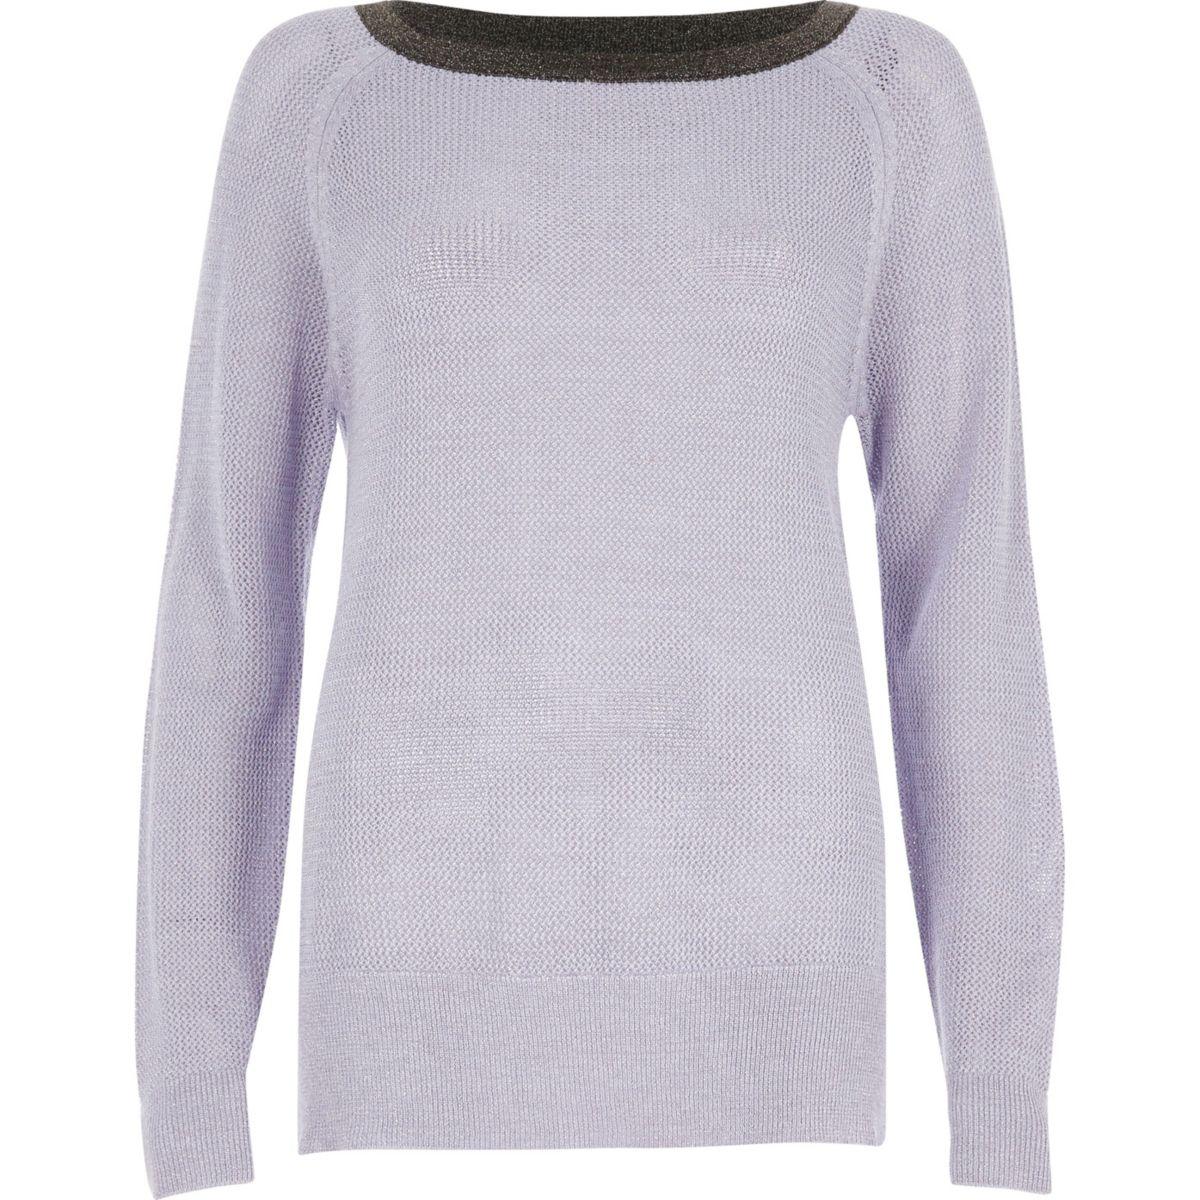 Lilac tipped raglan sleeve sweater